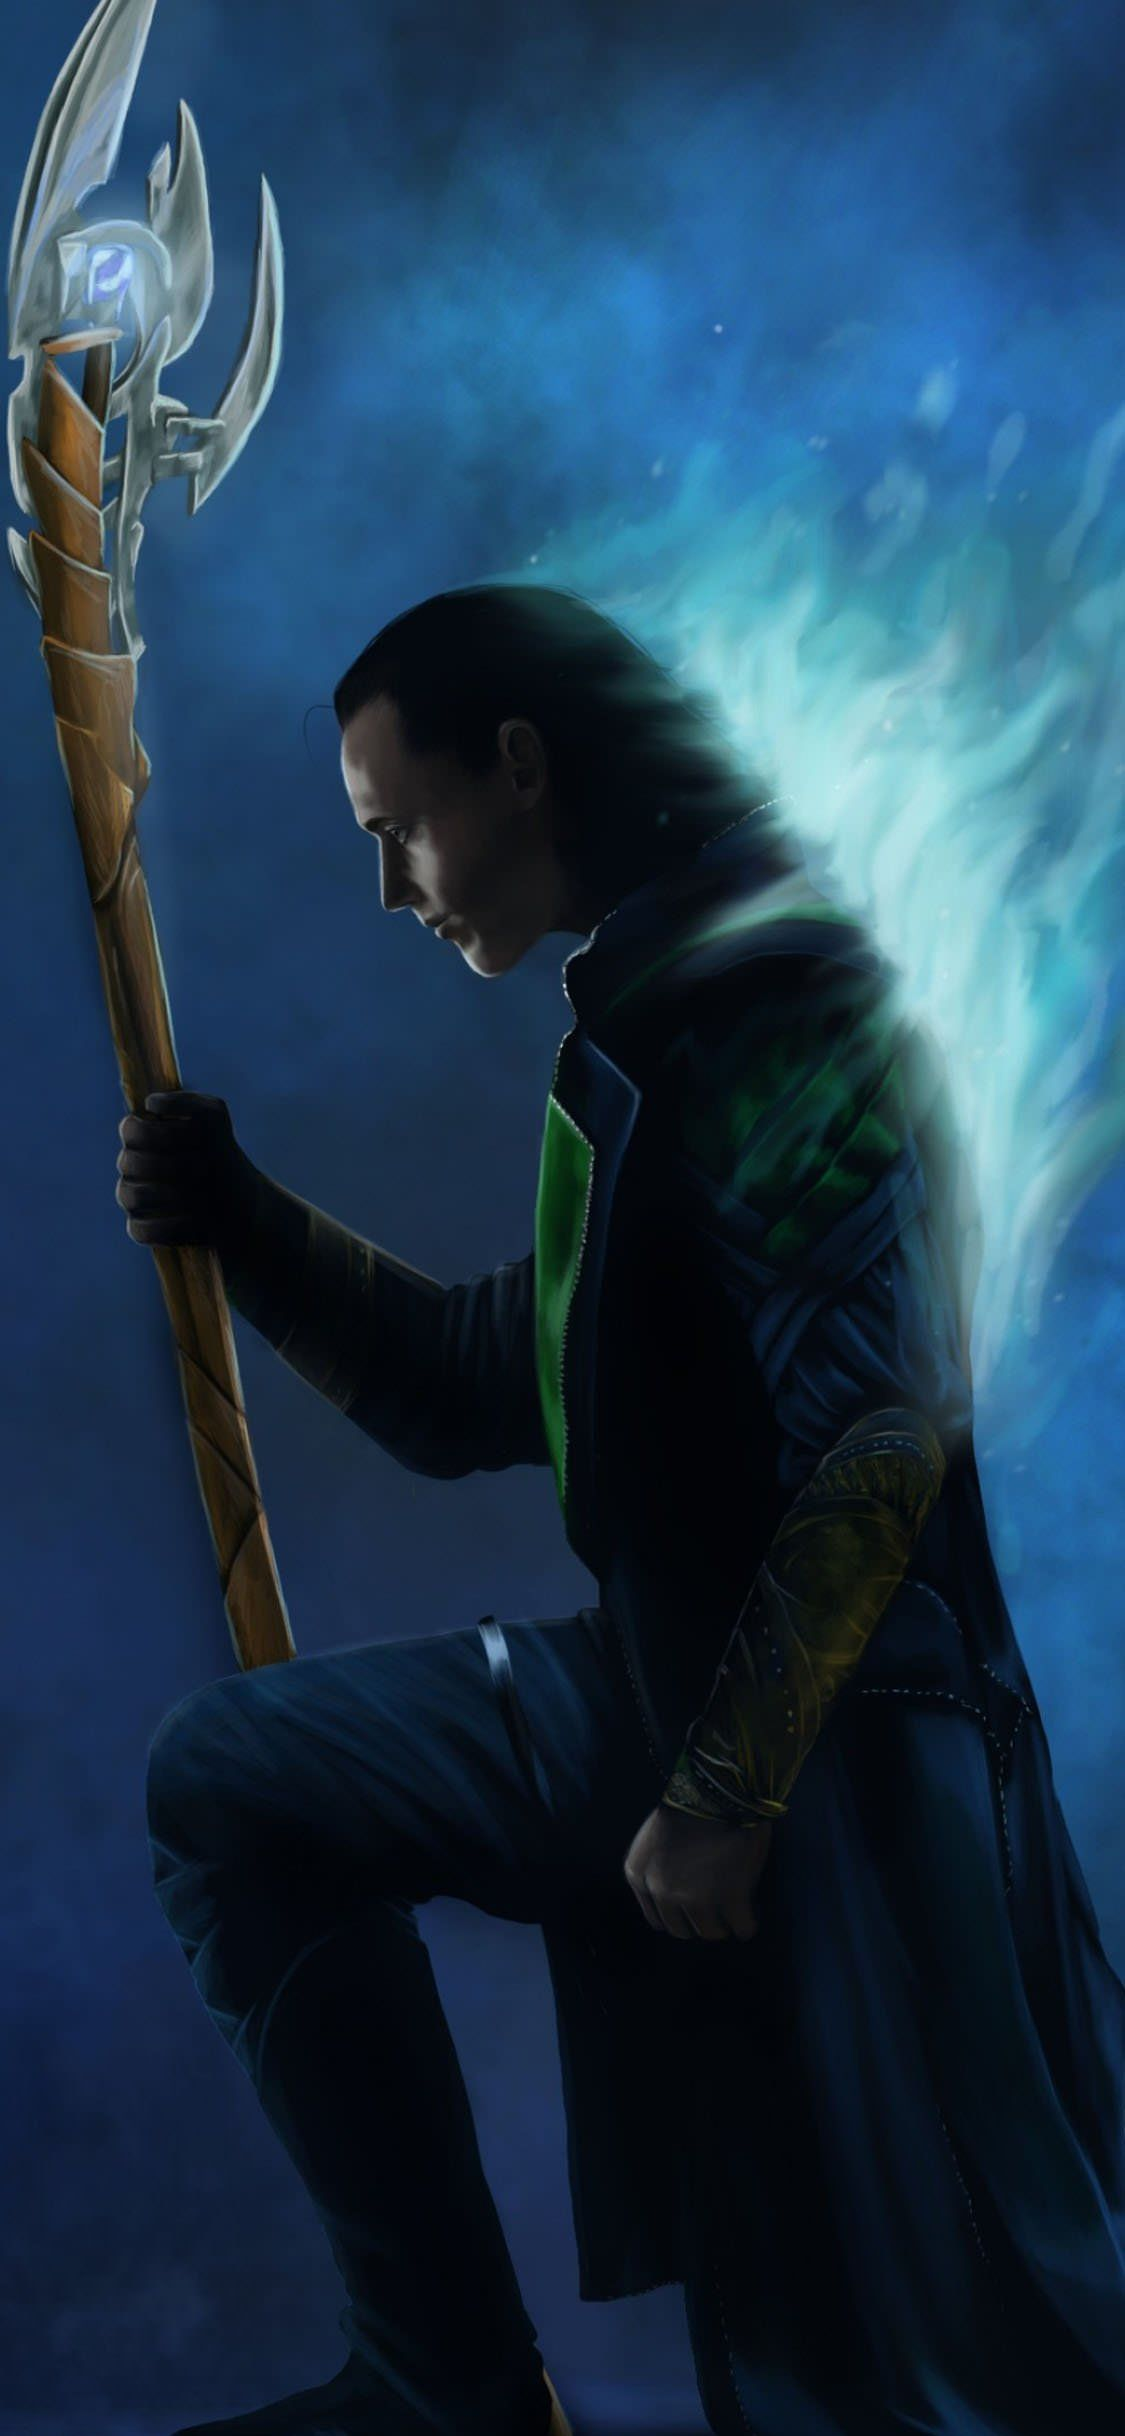 Avengers Loki Iphone Wallpapers Top Free Avengers Loki